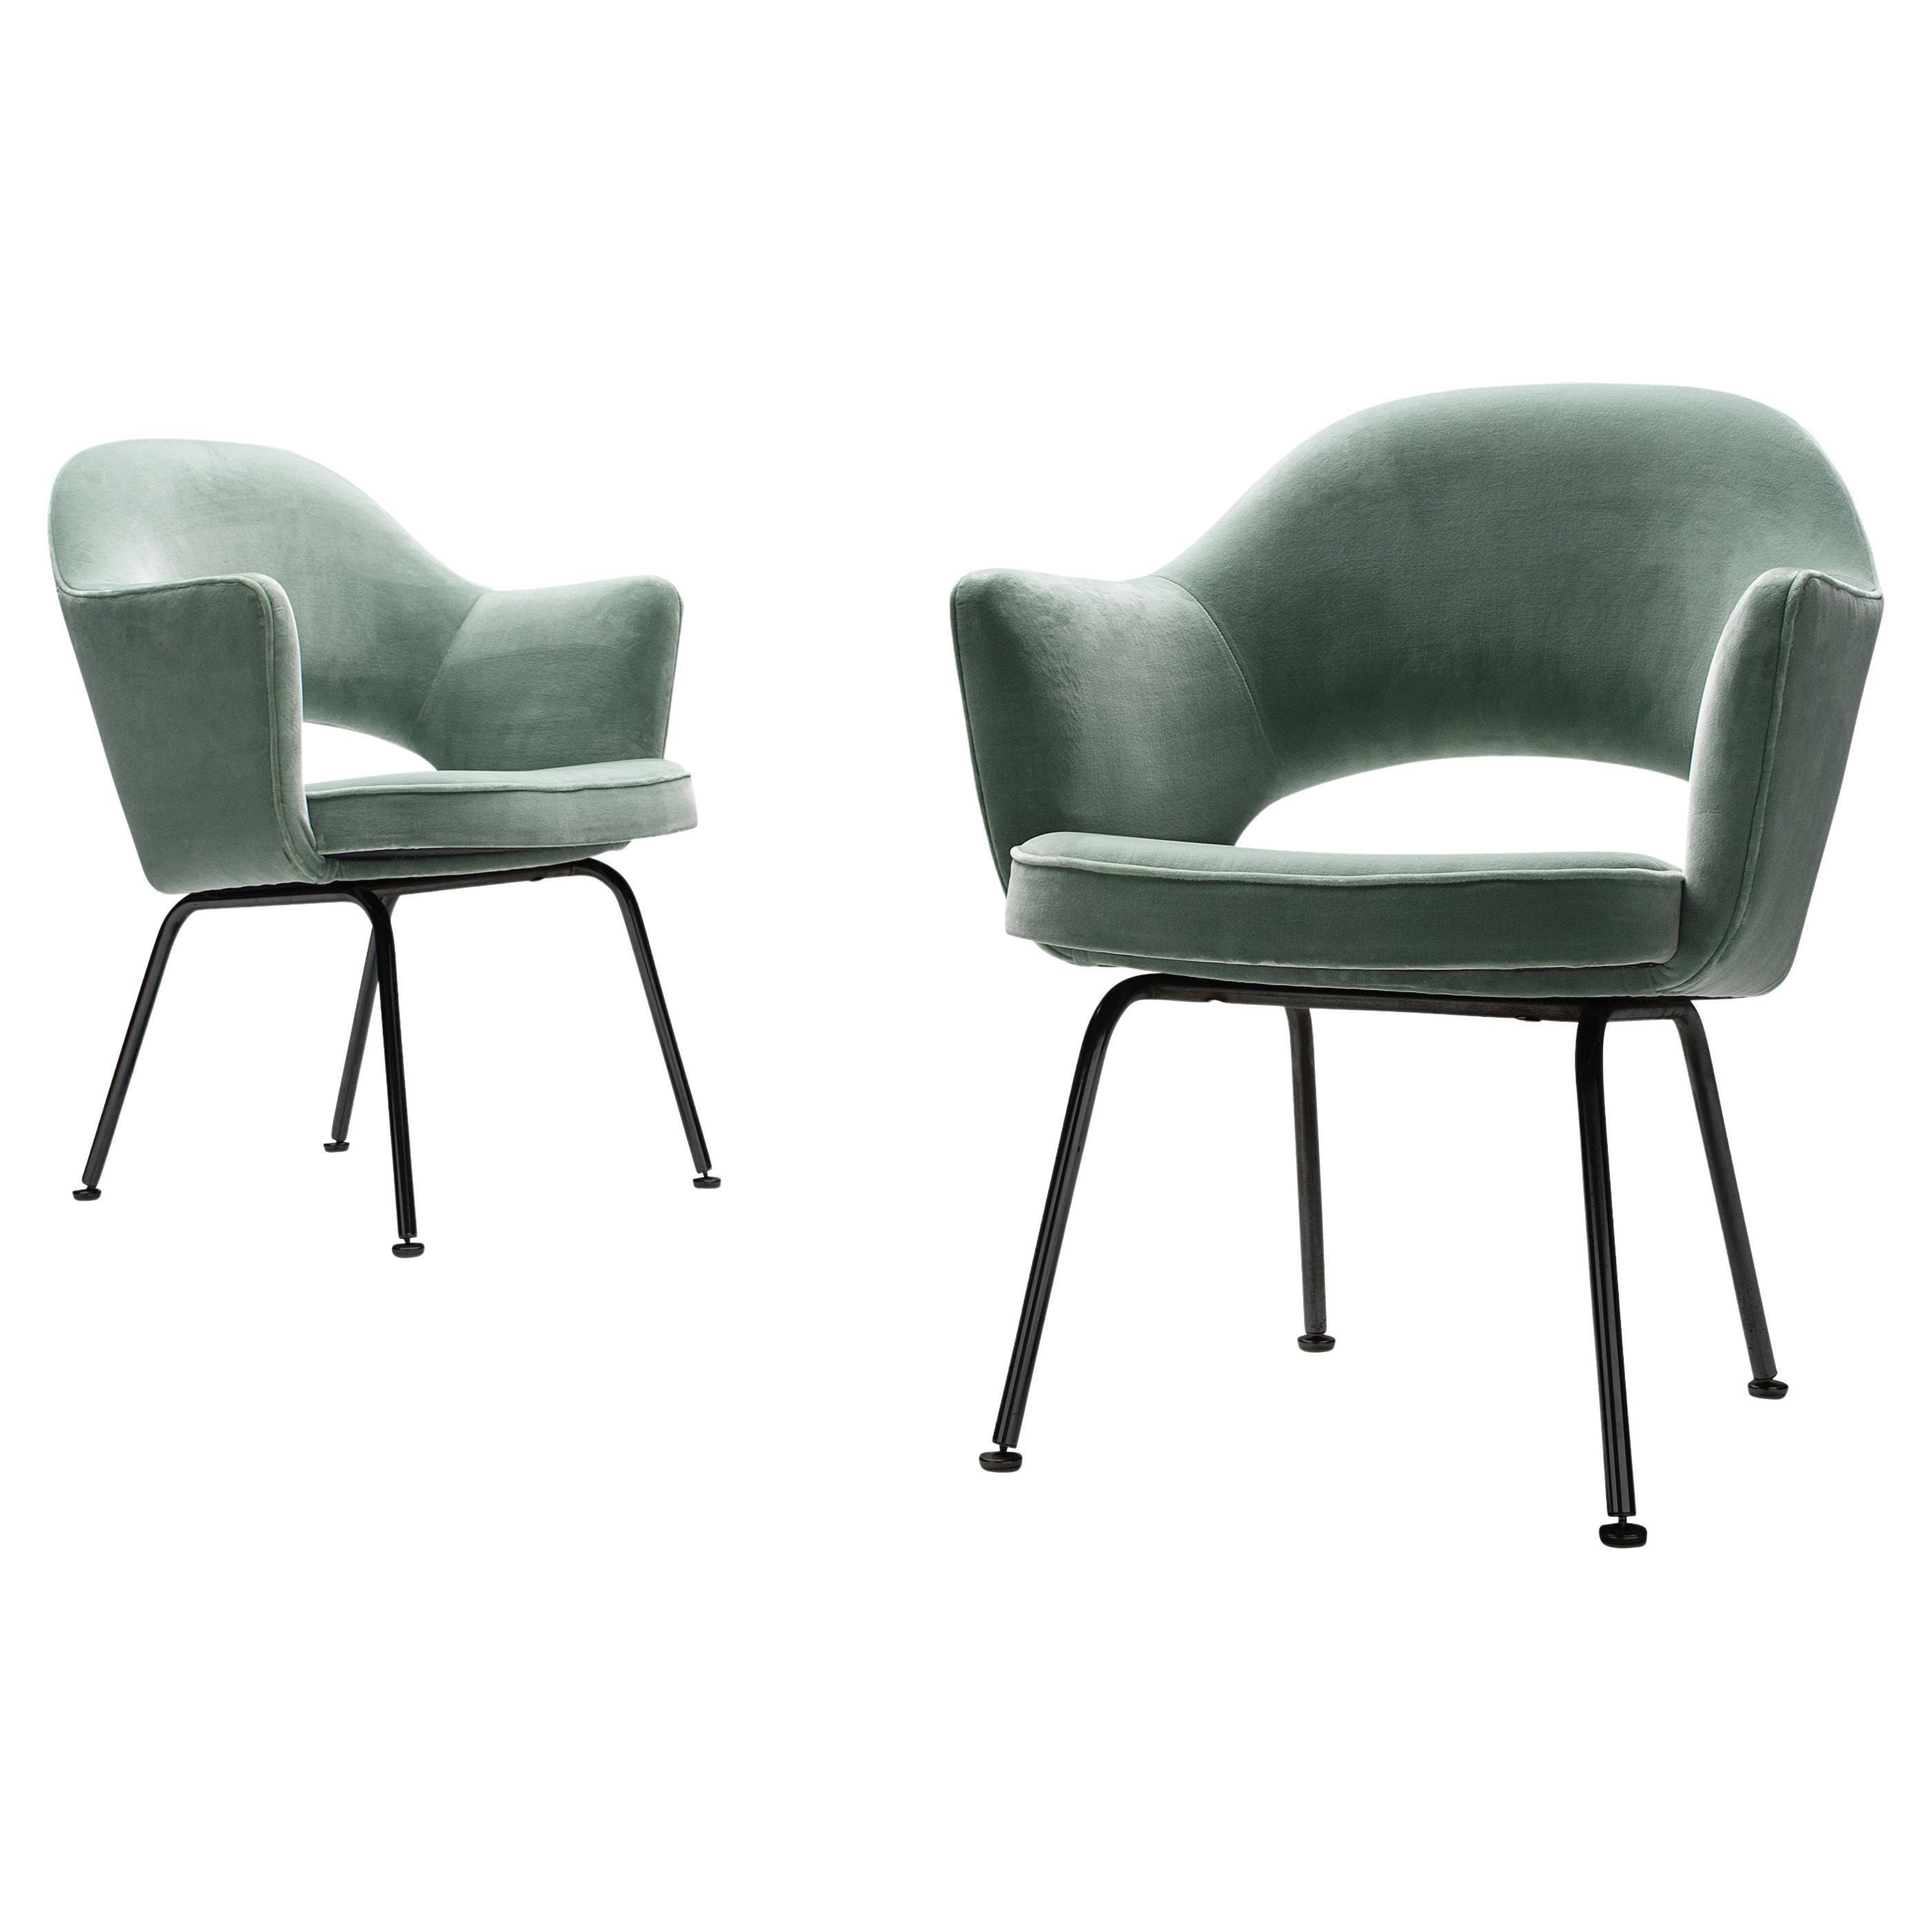 Eero Saarinen for Knoll International Pair of Dining Chairs